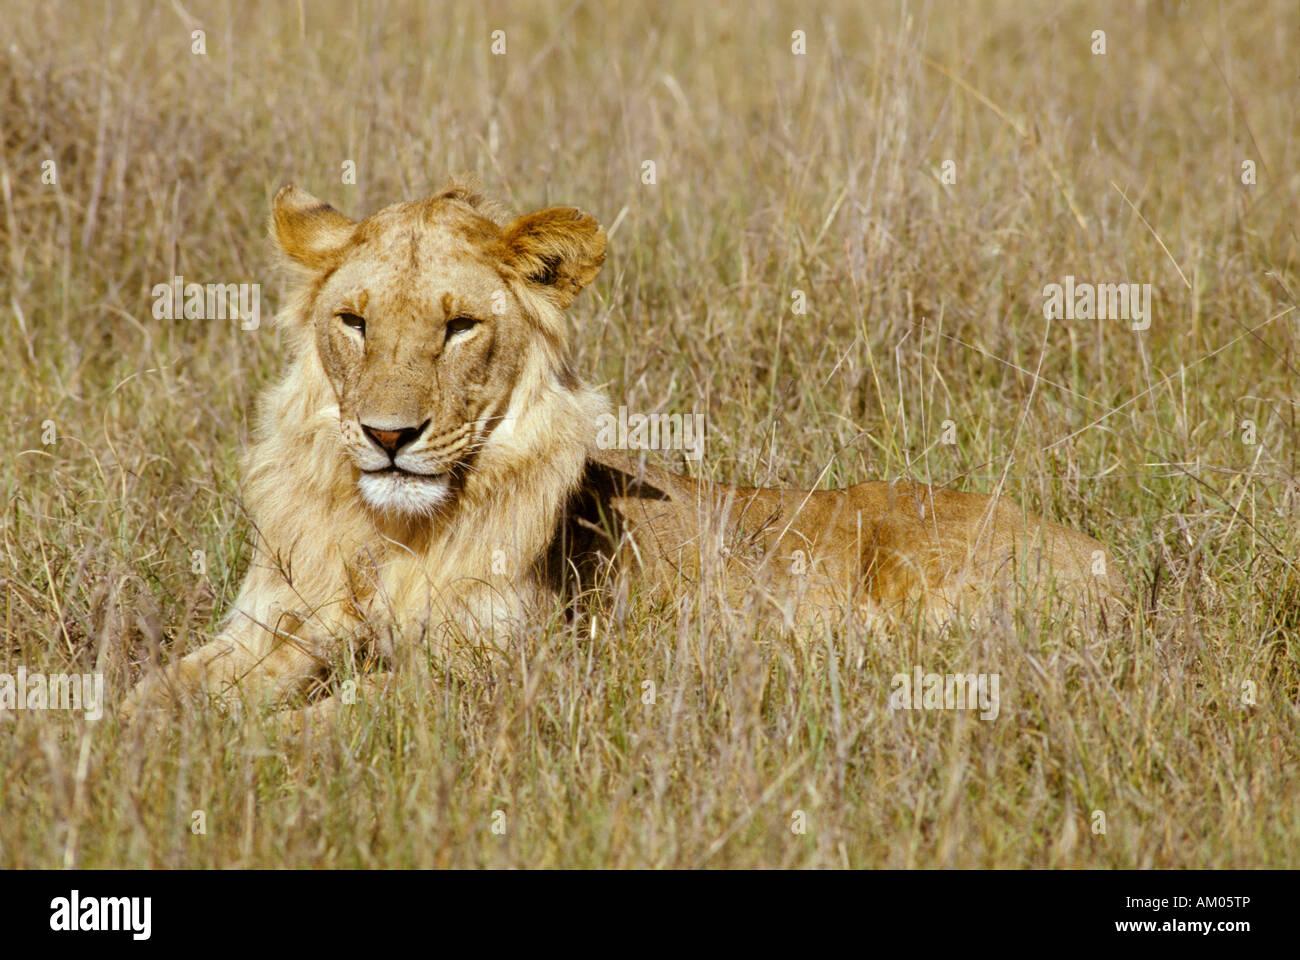 Young male lion (panthera leo) lying in high grass, Masai Mara National Reserve, Kenya Stock Photo